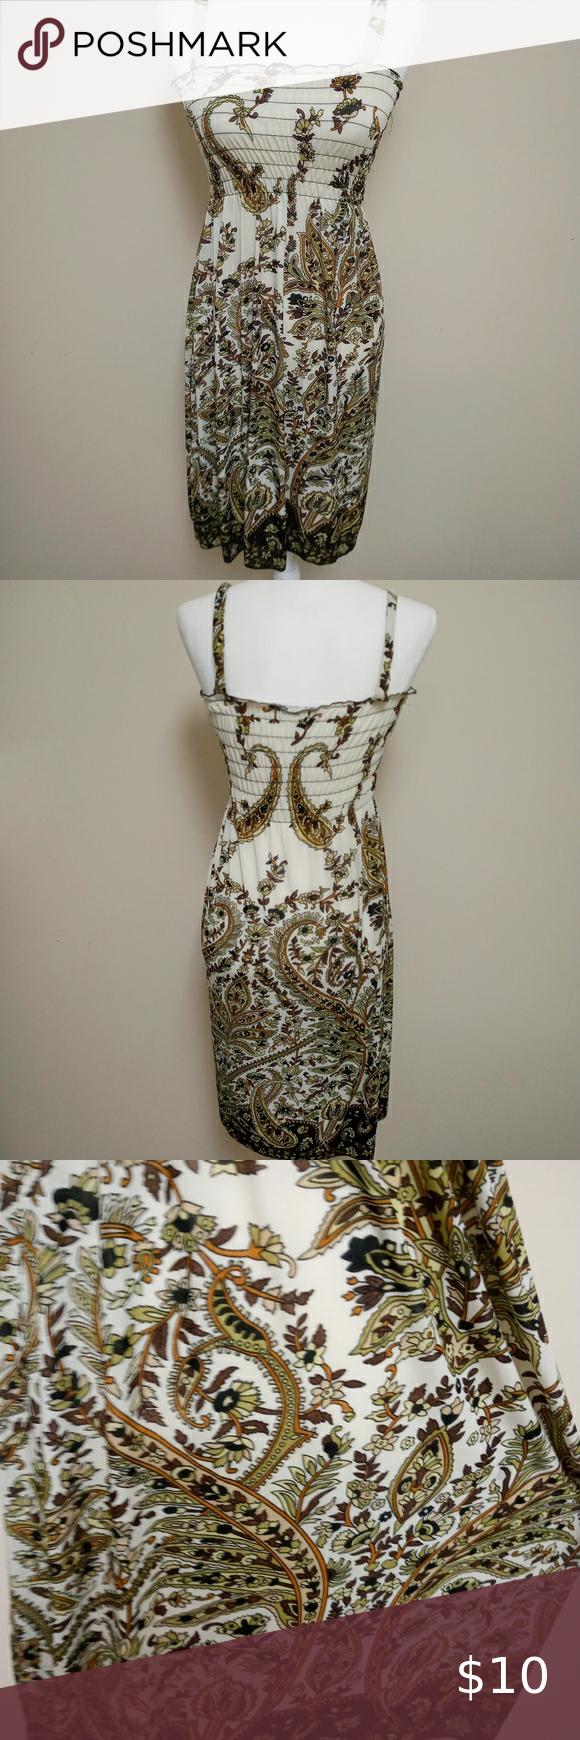 Silk Blend Stretchy Summer Dress Brown Cream Green In 2020 Summer Dresses Dresses Silk [ 1740 x 580 Pixel ]